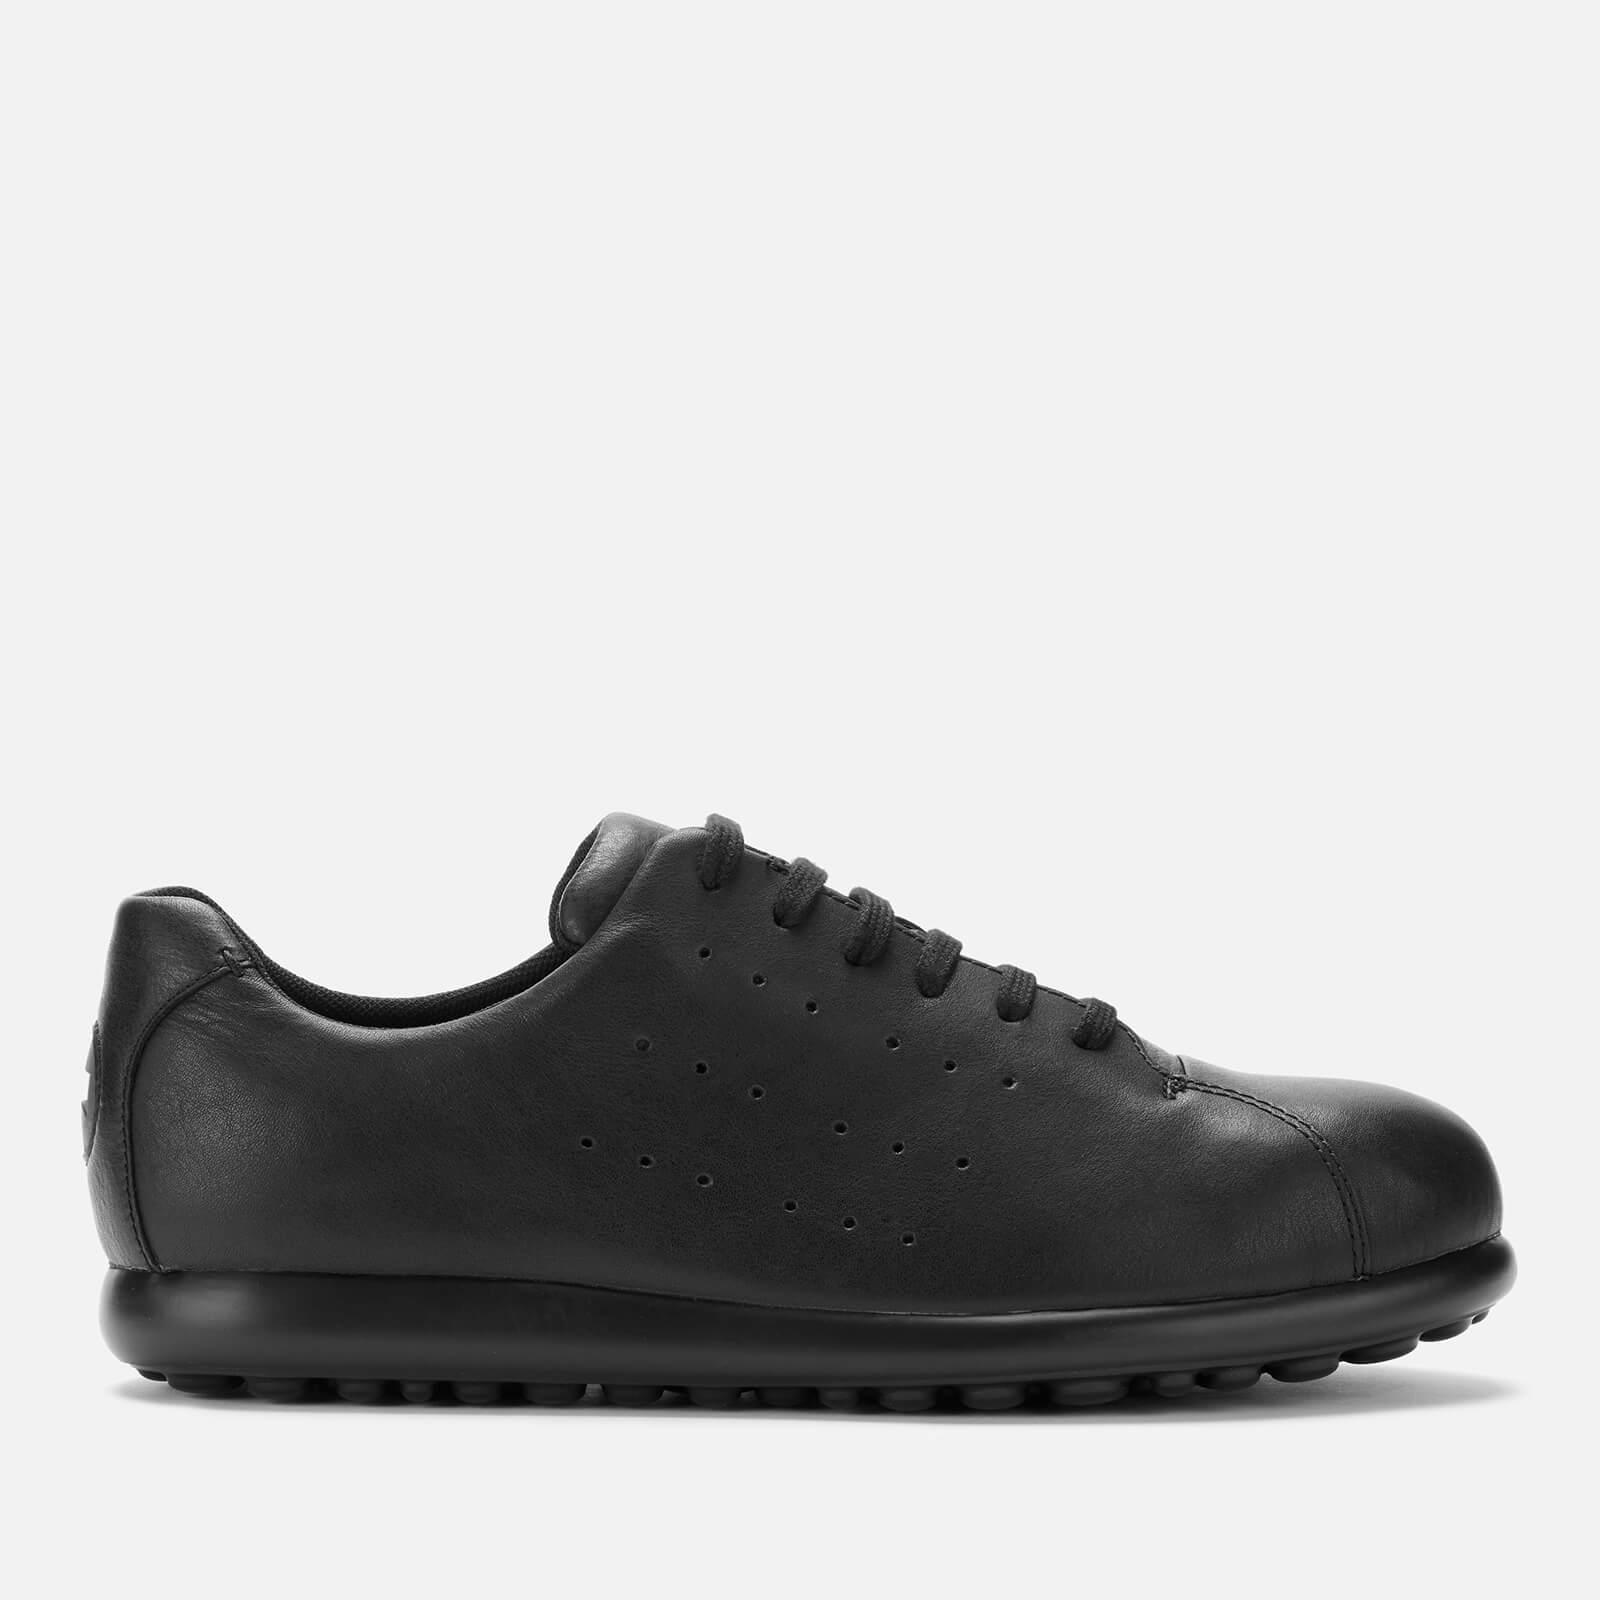 Camper Men's Pelotas Leather Low Top Shoes - Black - UK 7